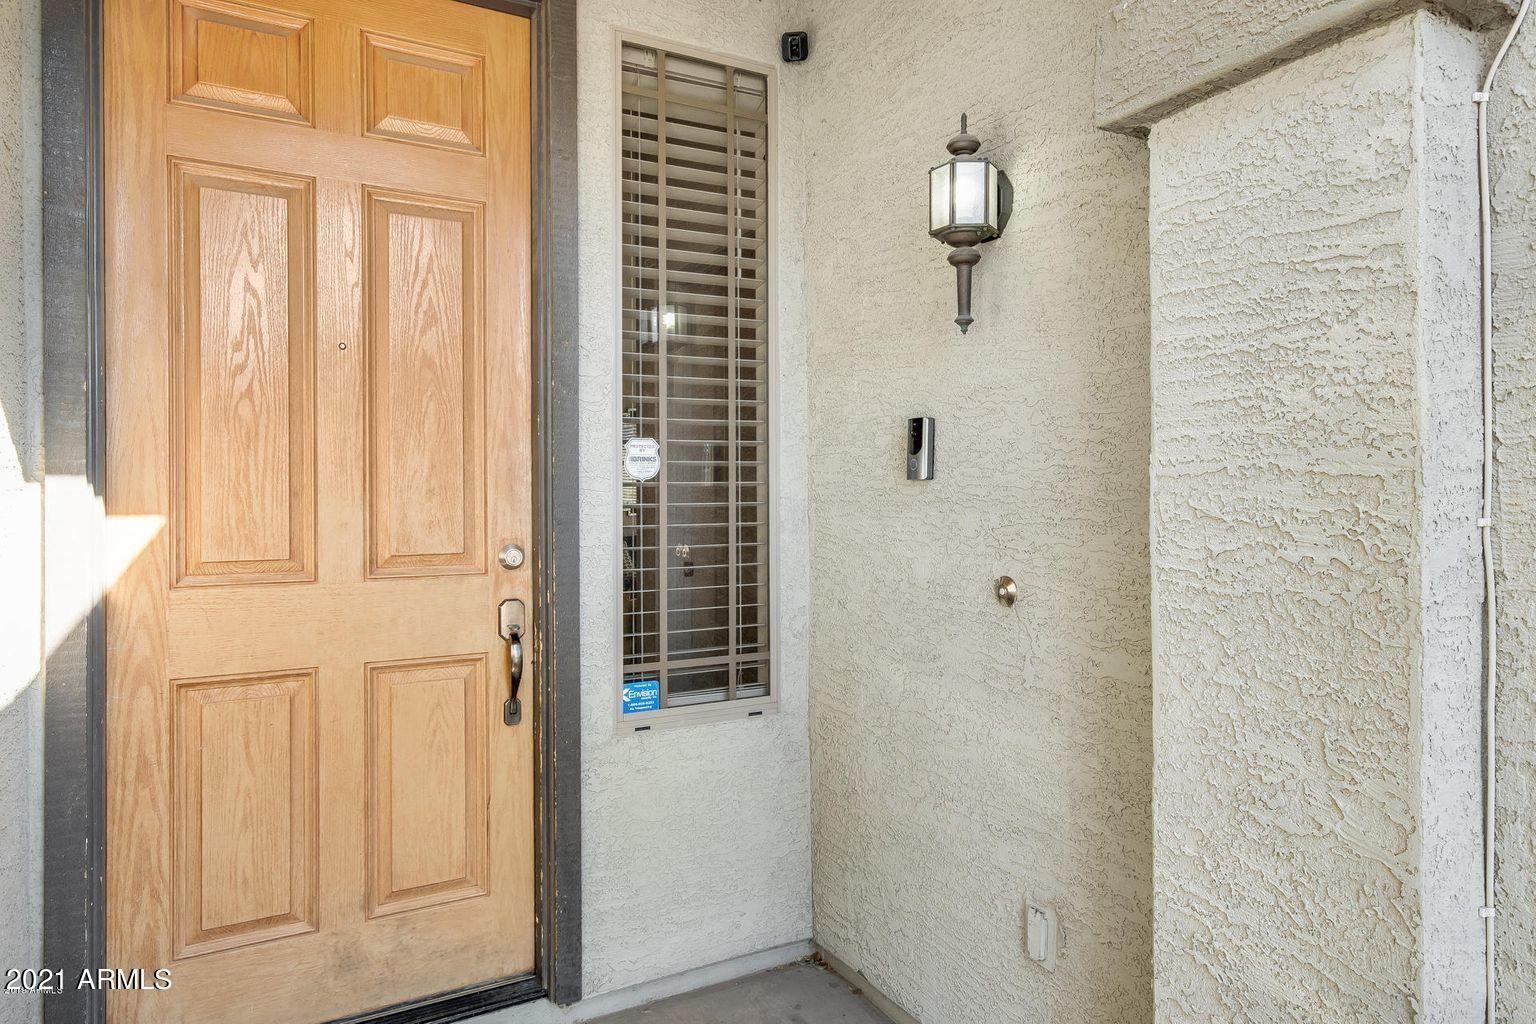 Photo of 10201 W FLORENCE Avenue, Tolleson, AZ 85353 (MLS # 6195326)